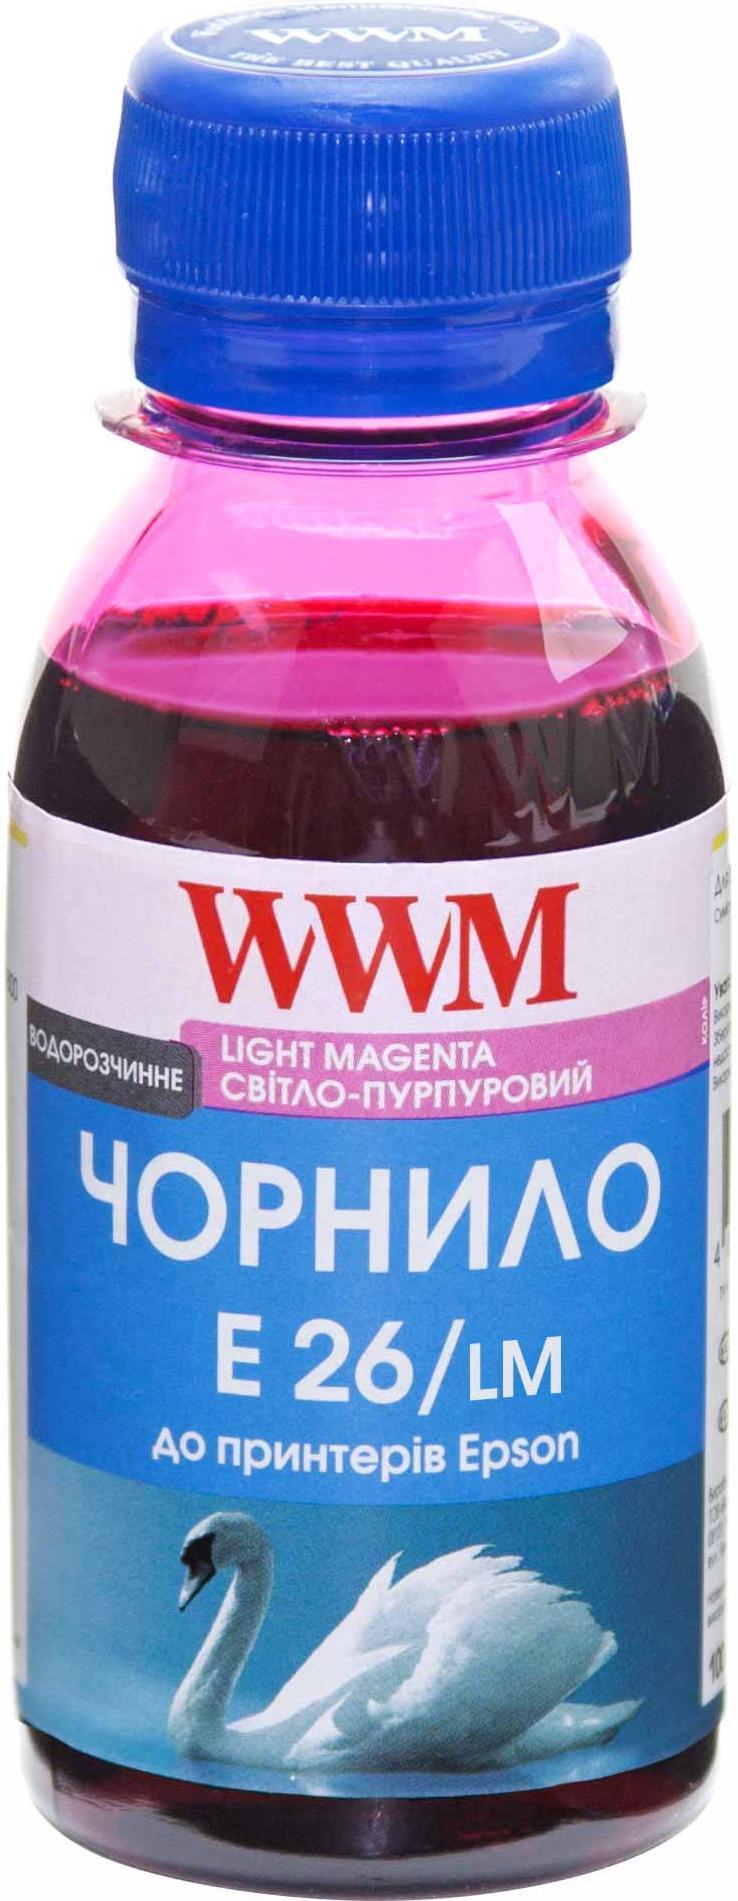 Купить Чорнило WWM for Epson Expression Photo XP-55/XP-750/XP-850 Light Magenta 100g (E26/LM-2)